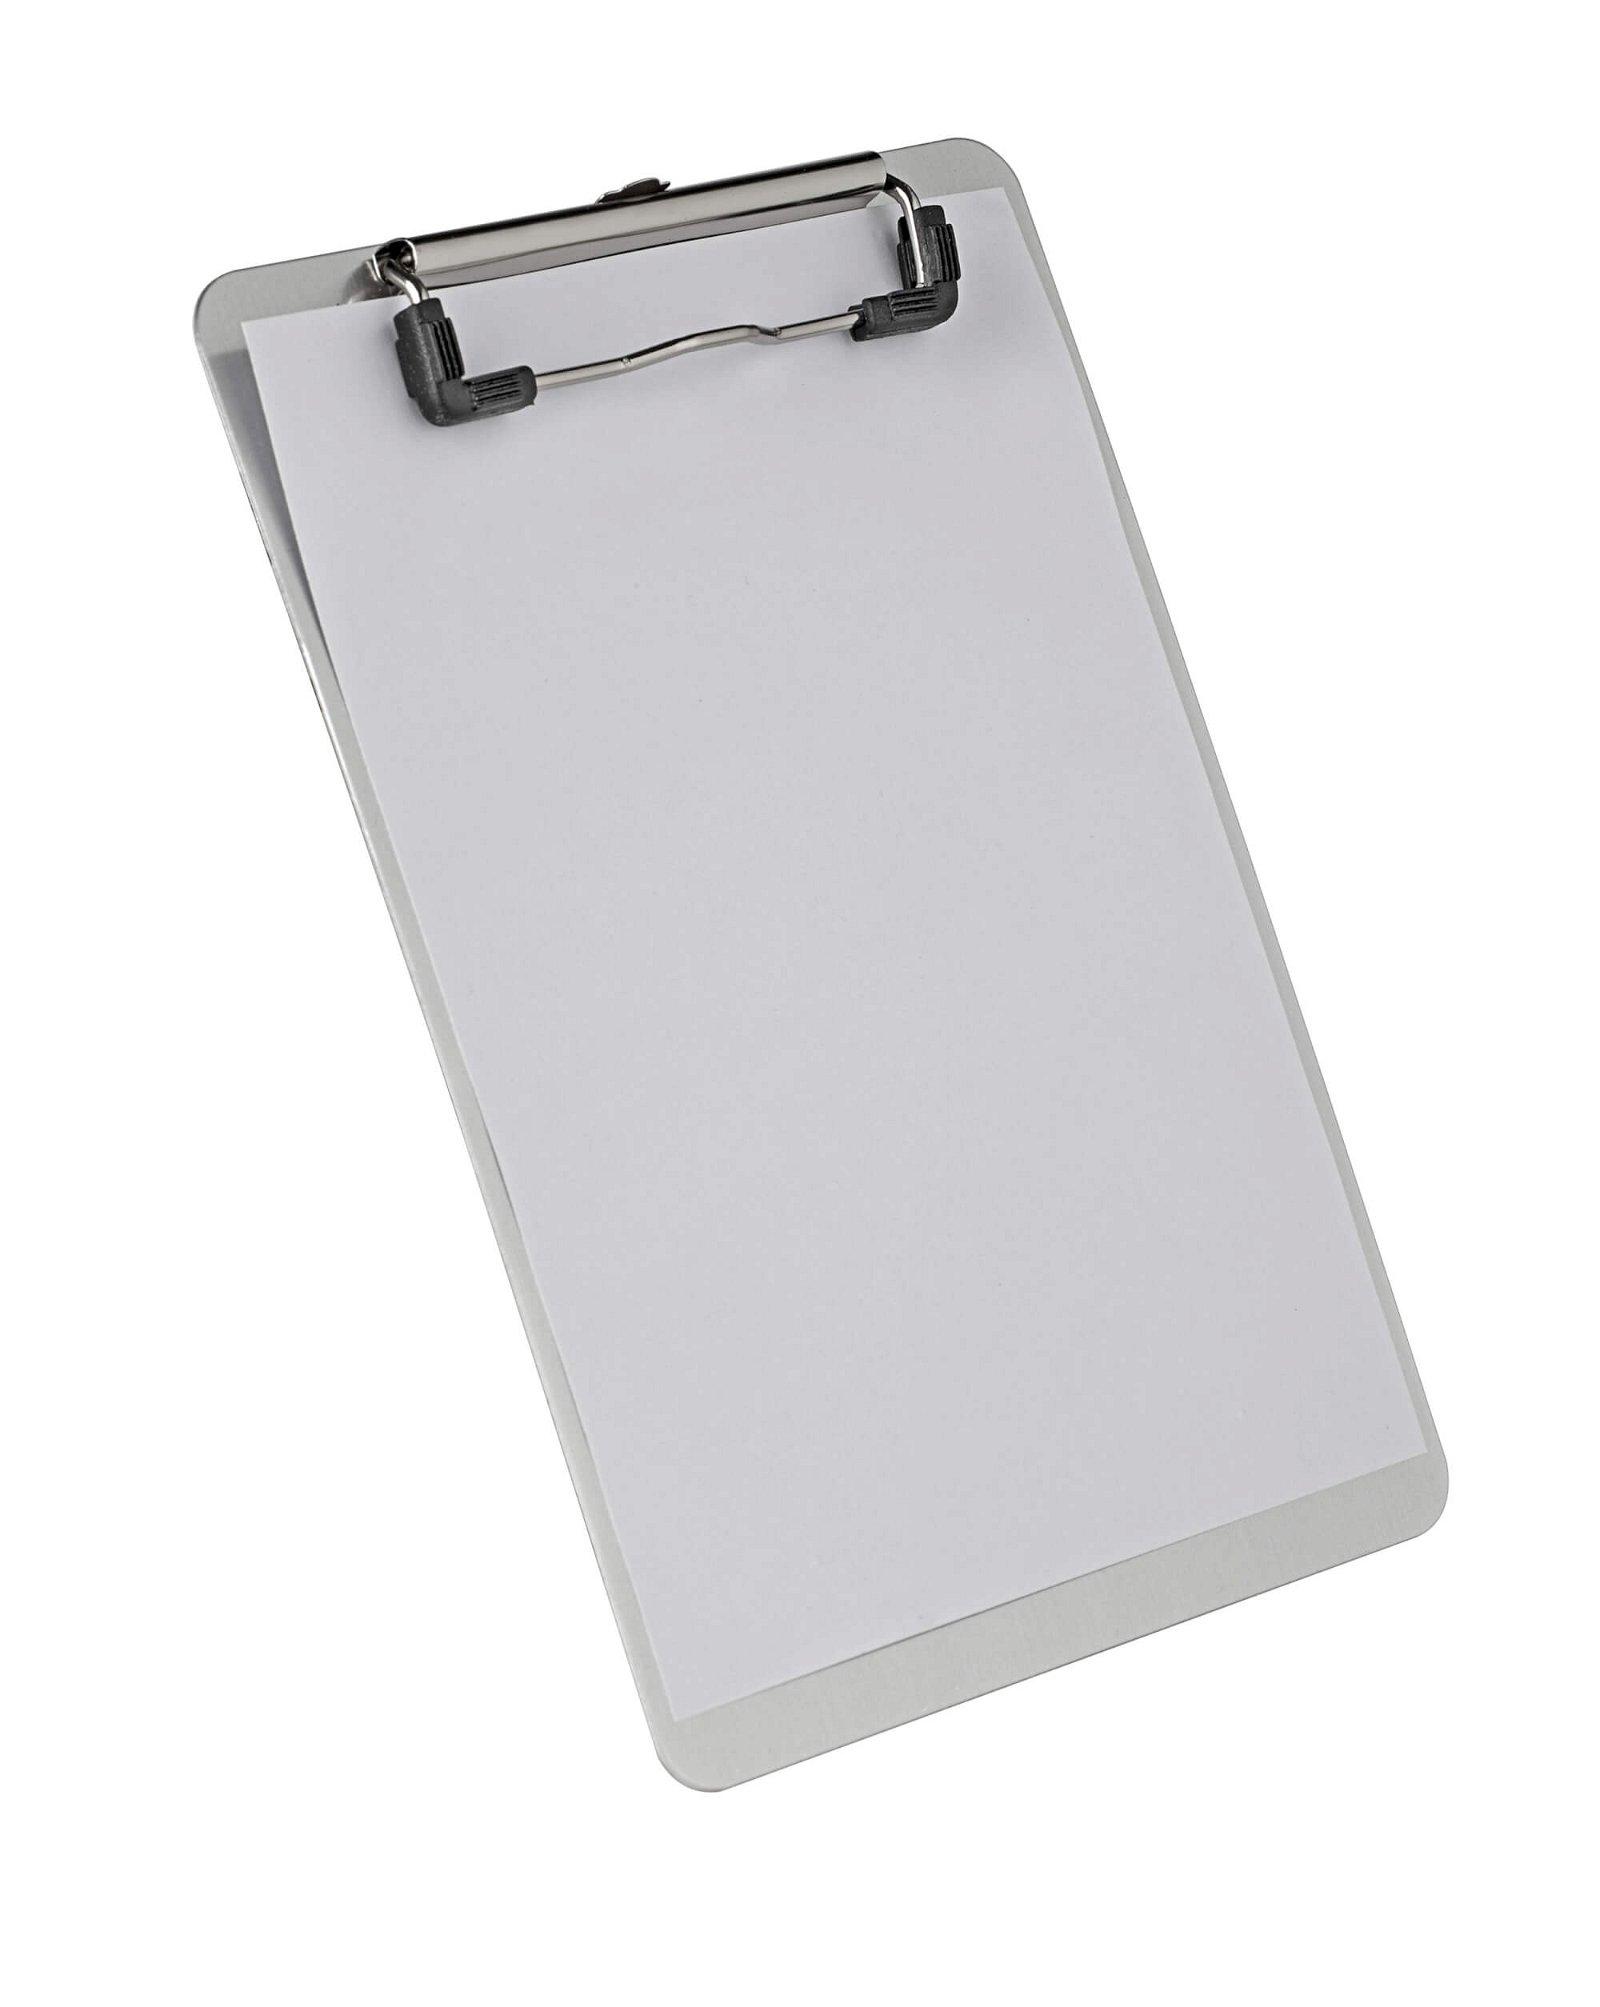 A5 Schreibplatte Aluminium mit Bügelklemme, aluminium